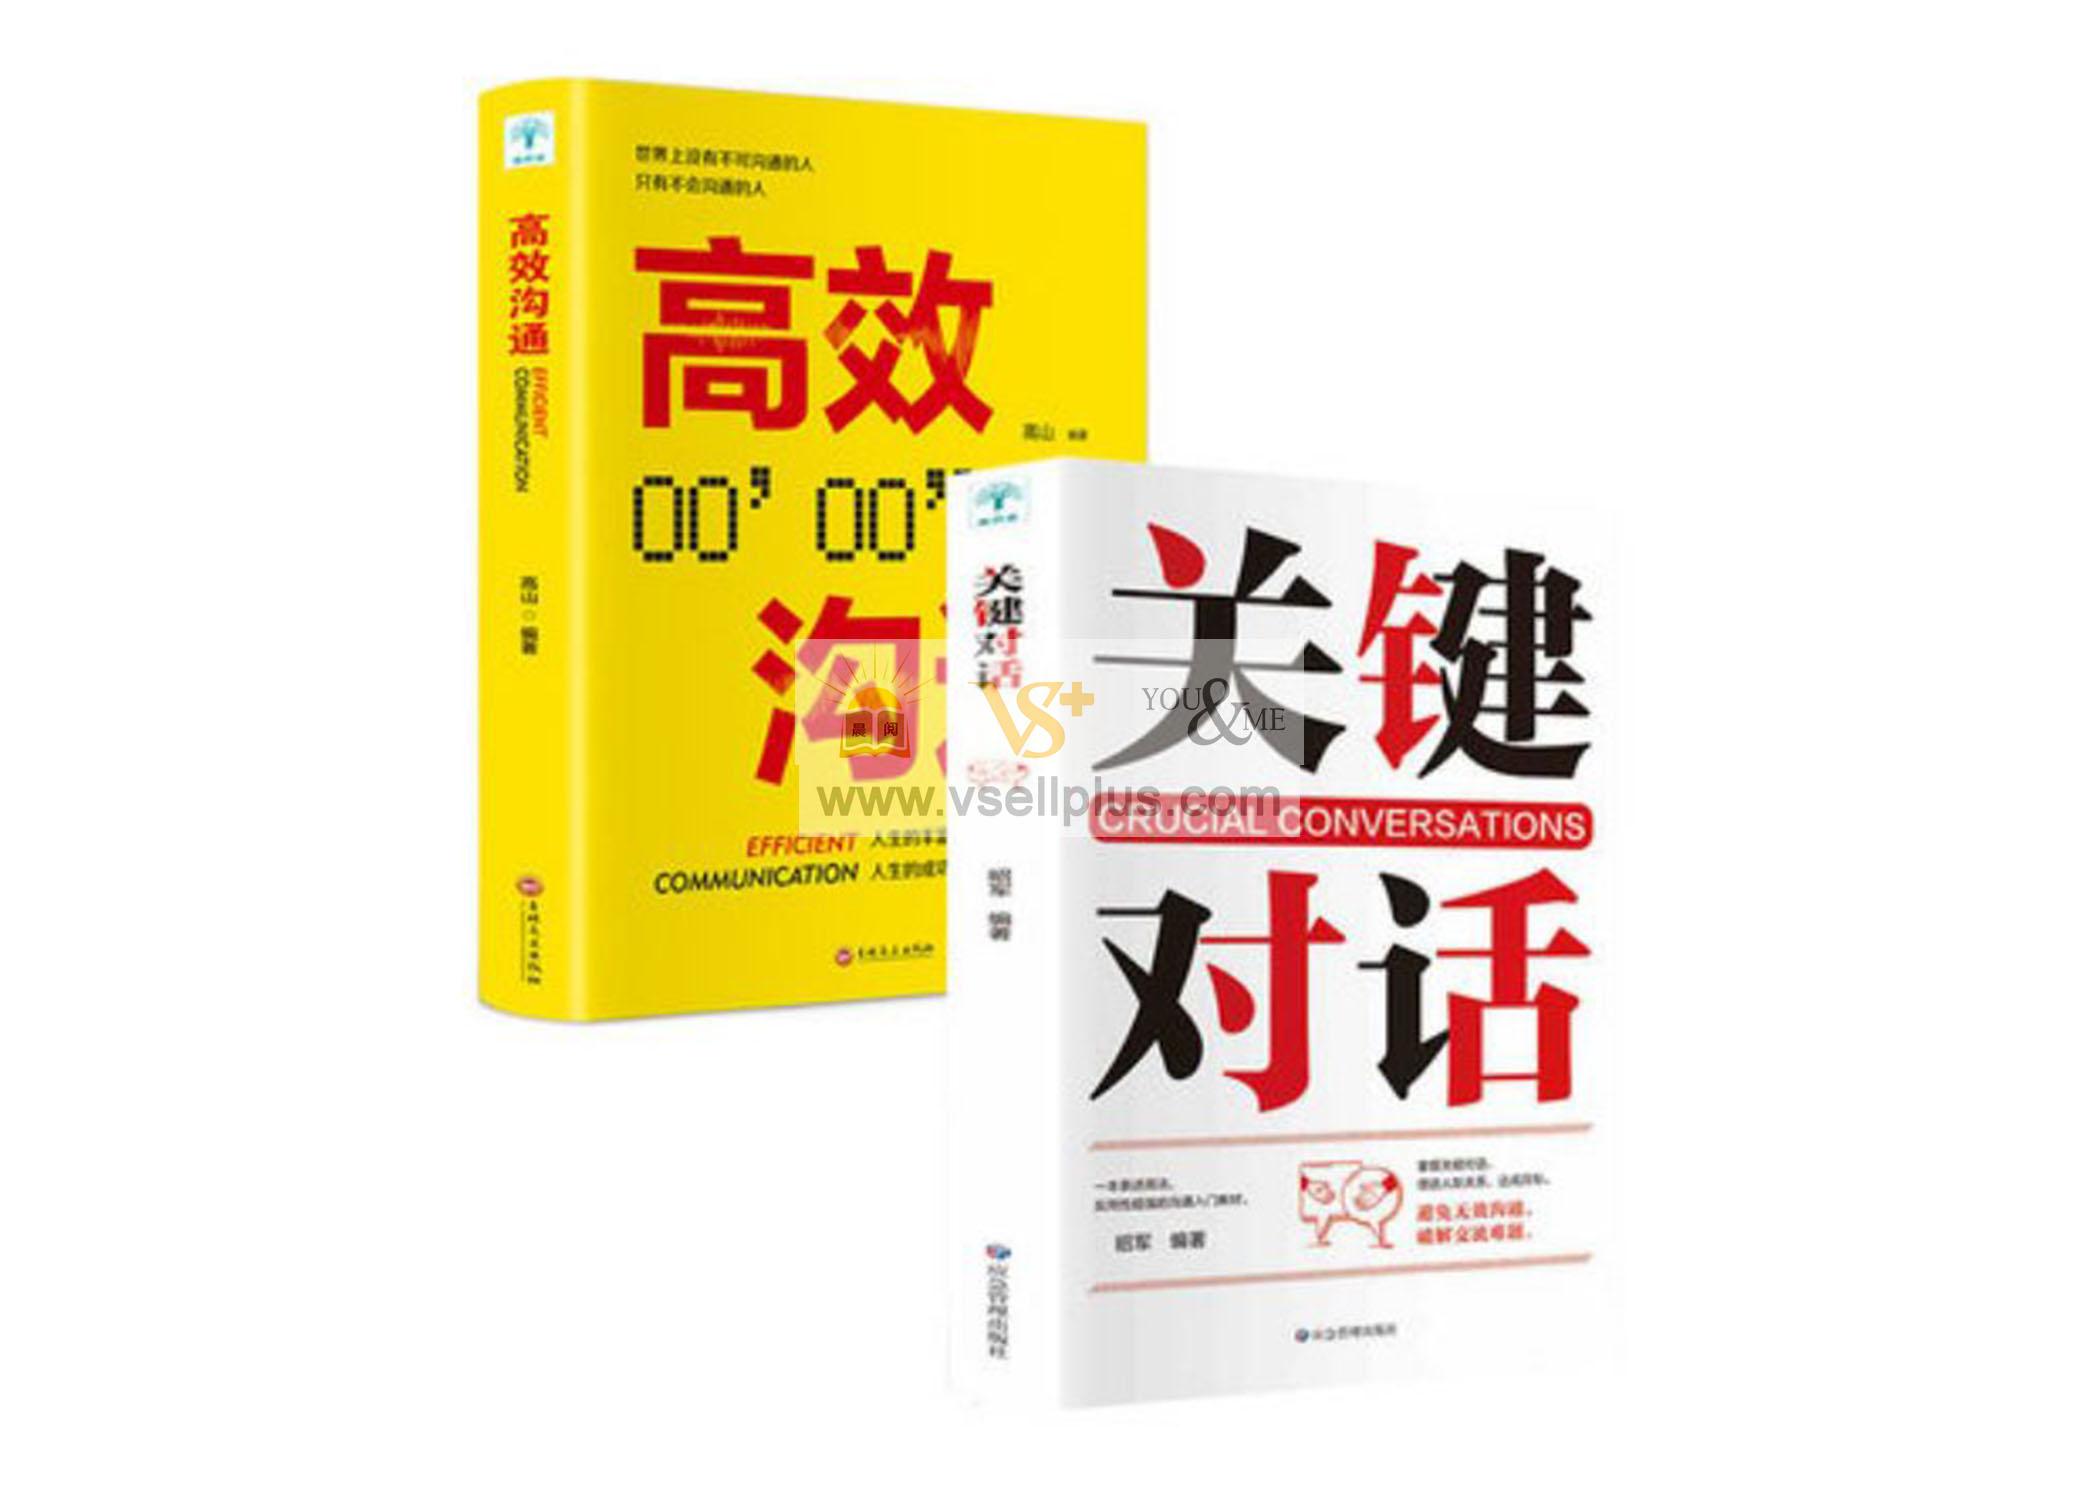 Ready Stock- Self help books 全套2册关键对话 +高效沟通人际交往心理学情商训练沟通技巧书籍